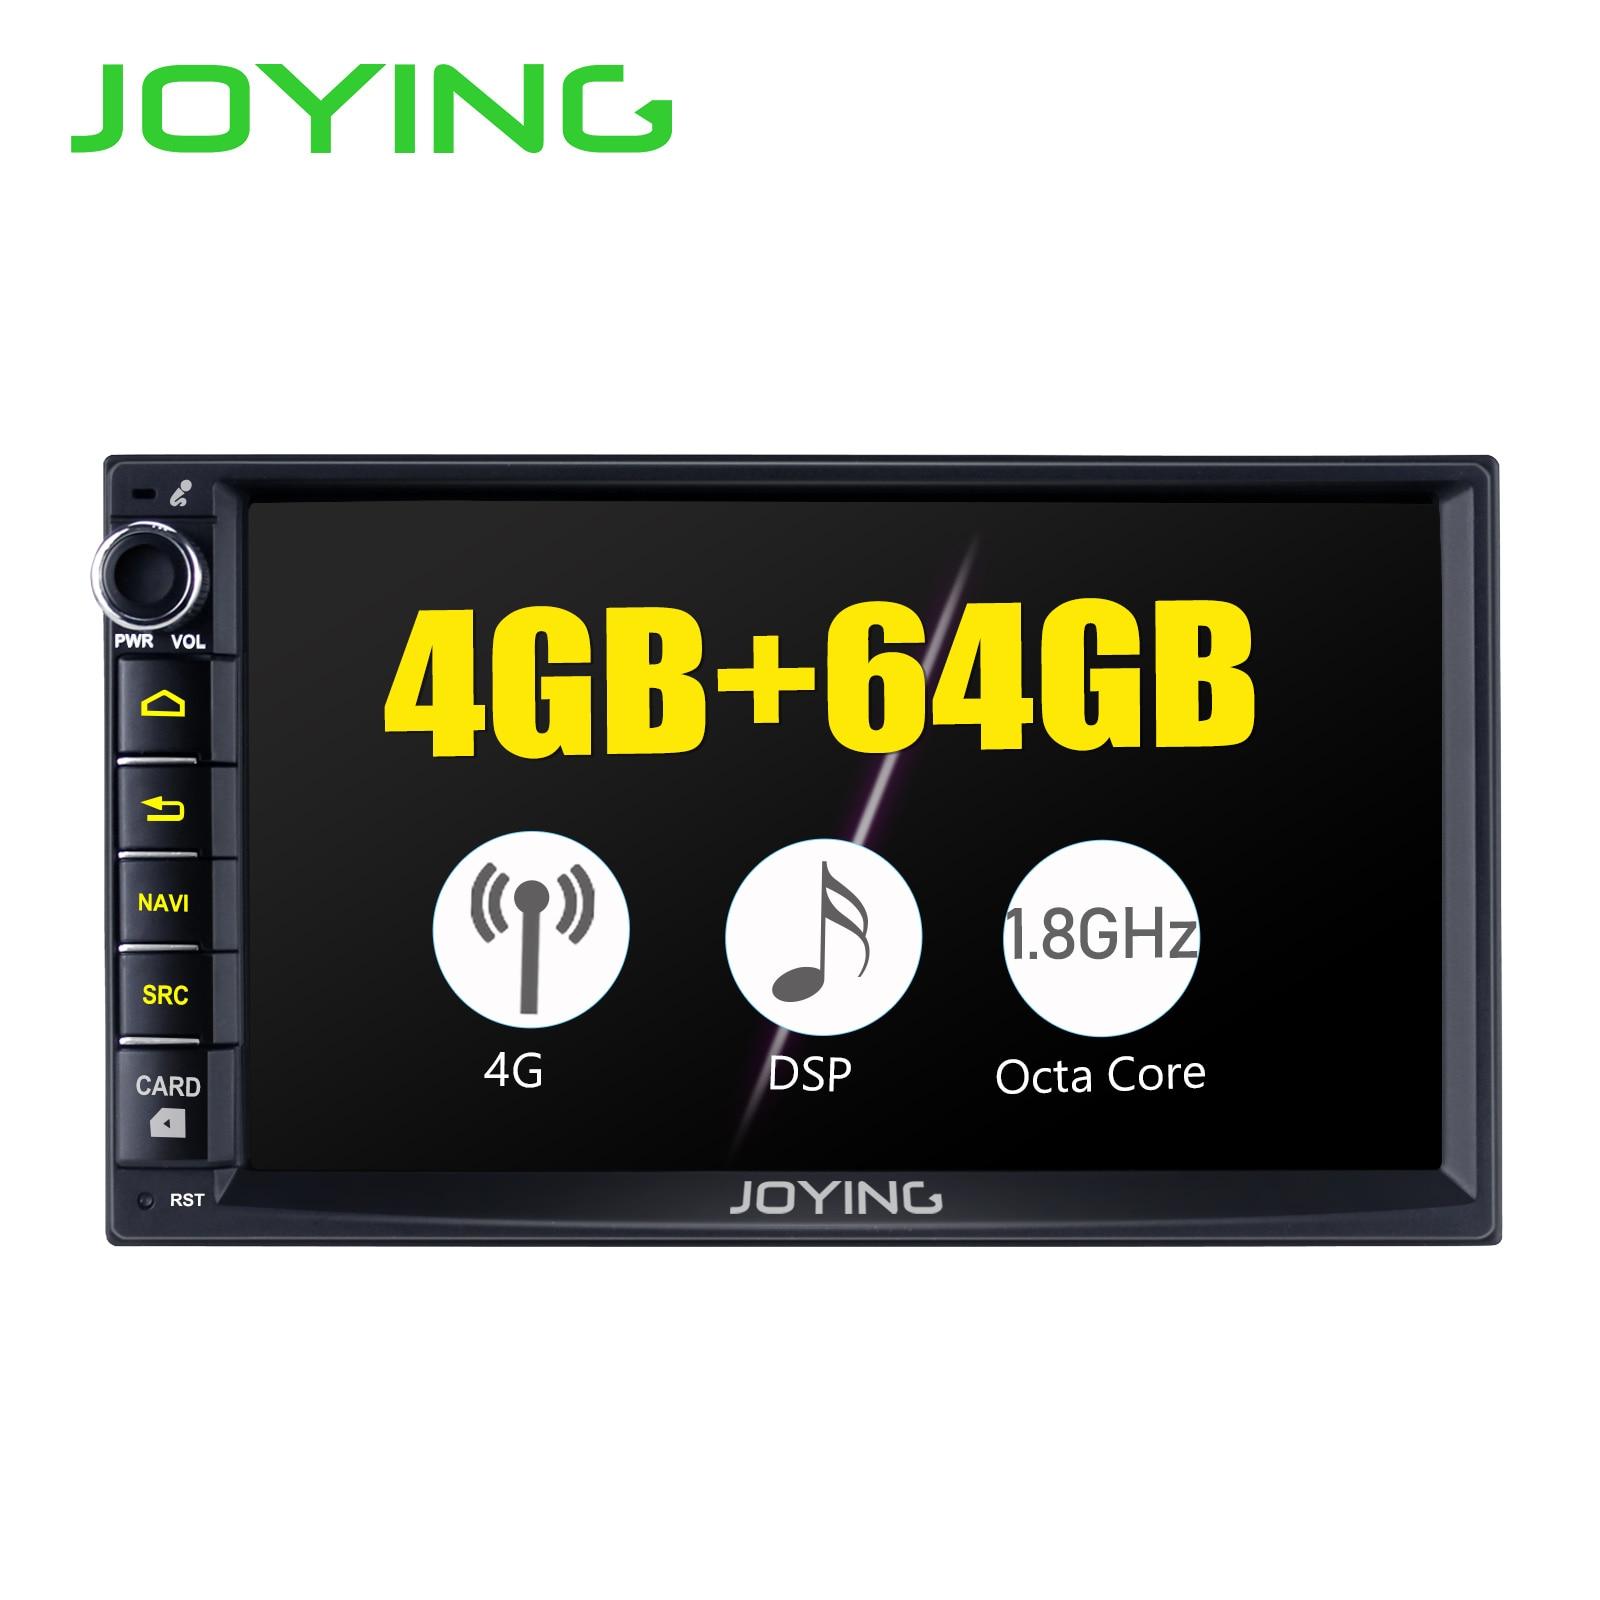 JOYING 7 Octa Core 2 din Android 8 1 Car Multimedia Player Built in 4G Module